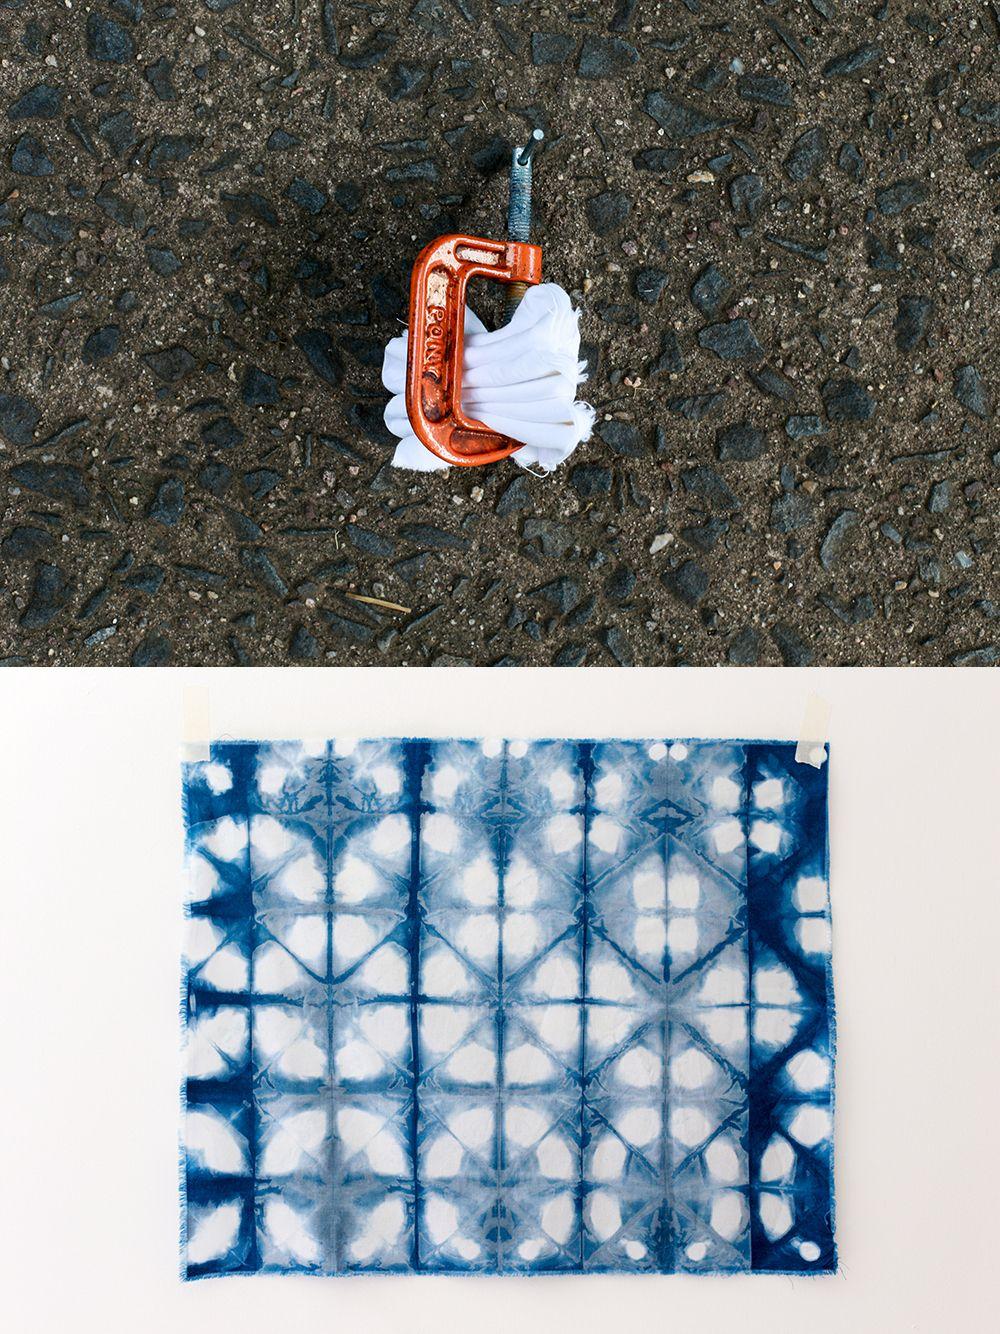 DIY Shibori Indigo Dyeing Tutorial #dyeingtutorials